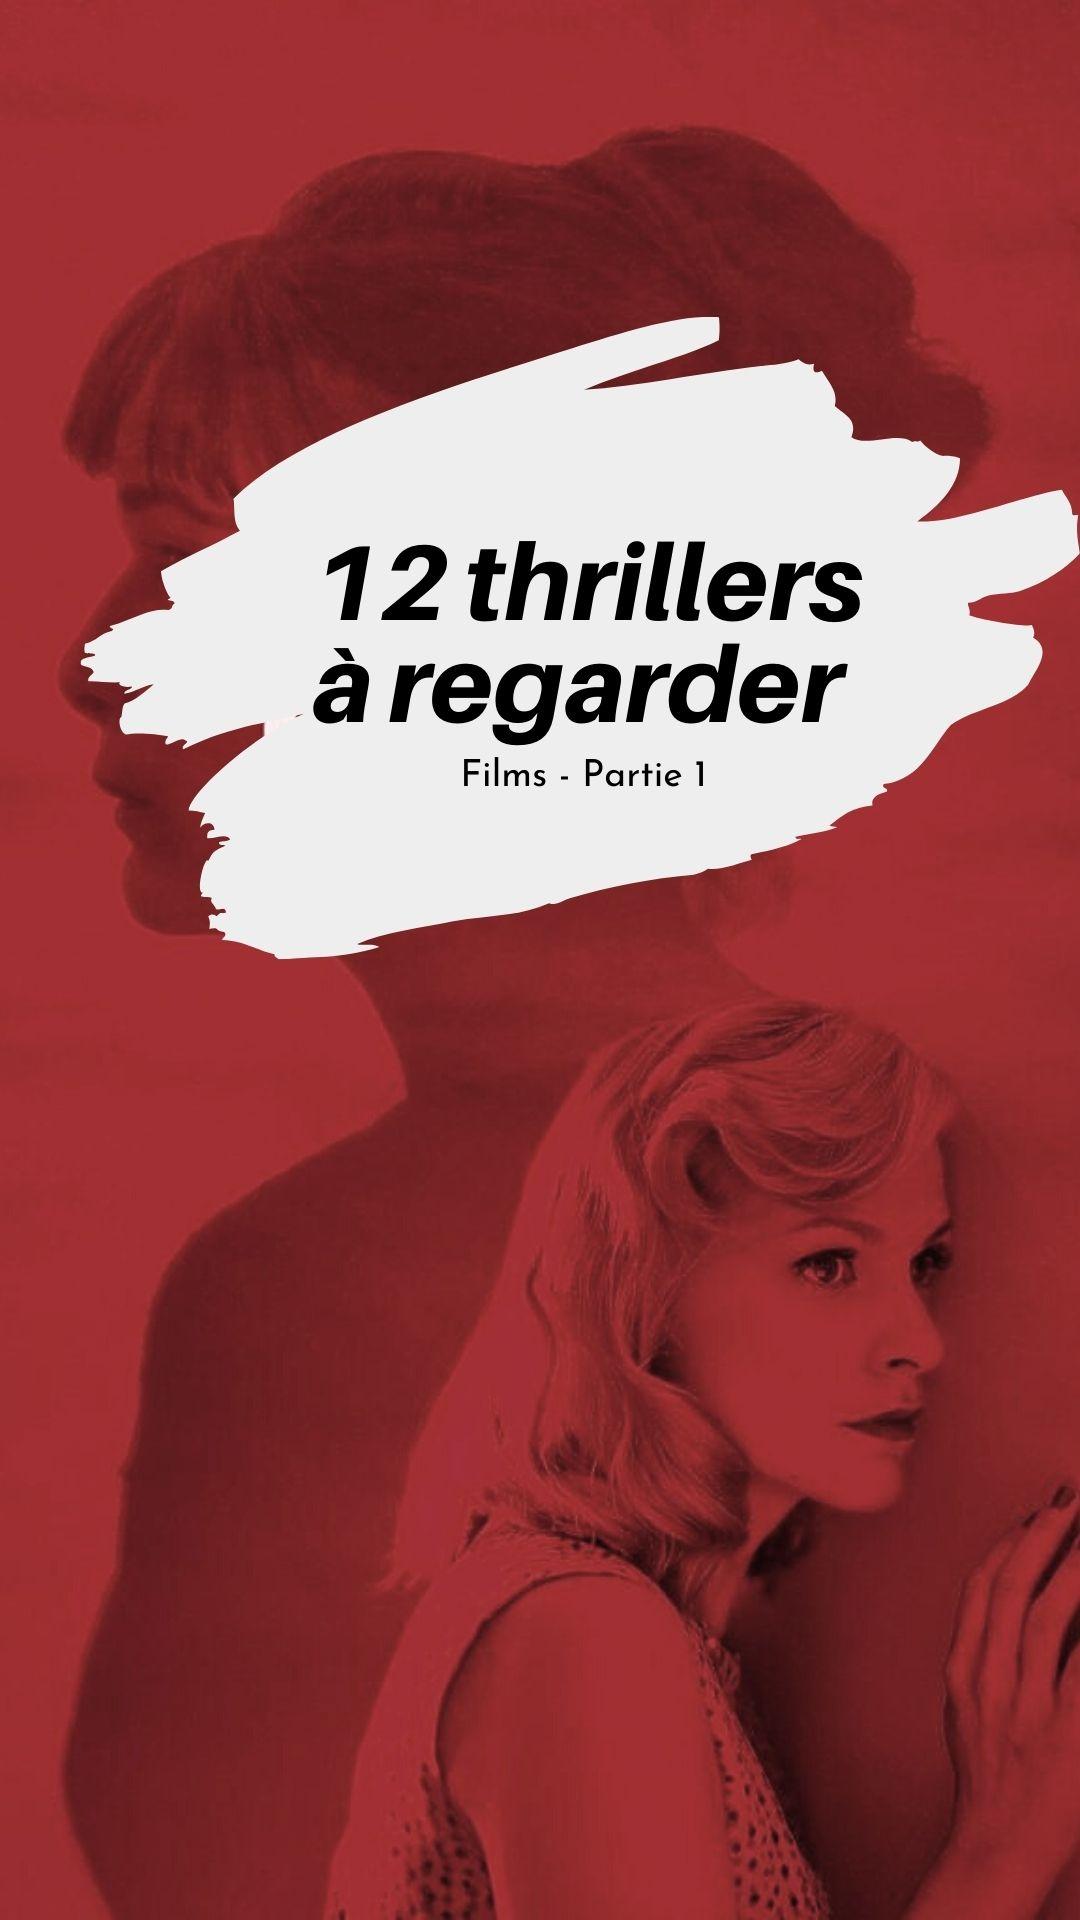 12 thrillers film à regarder made by f.